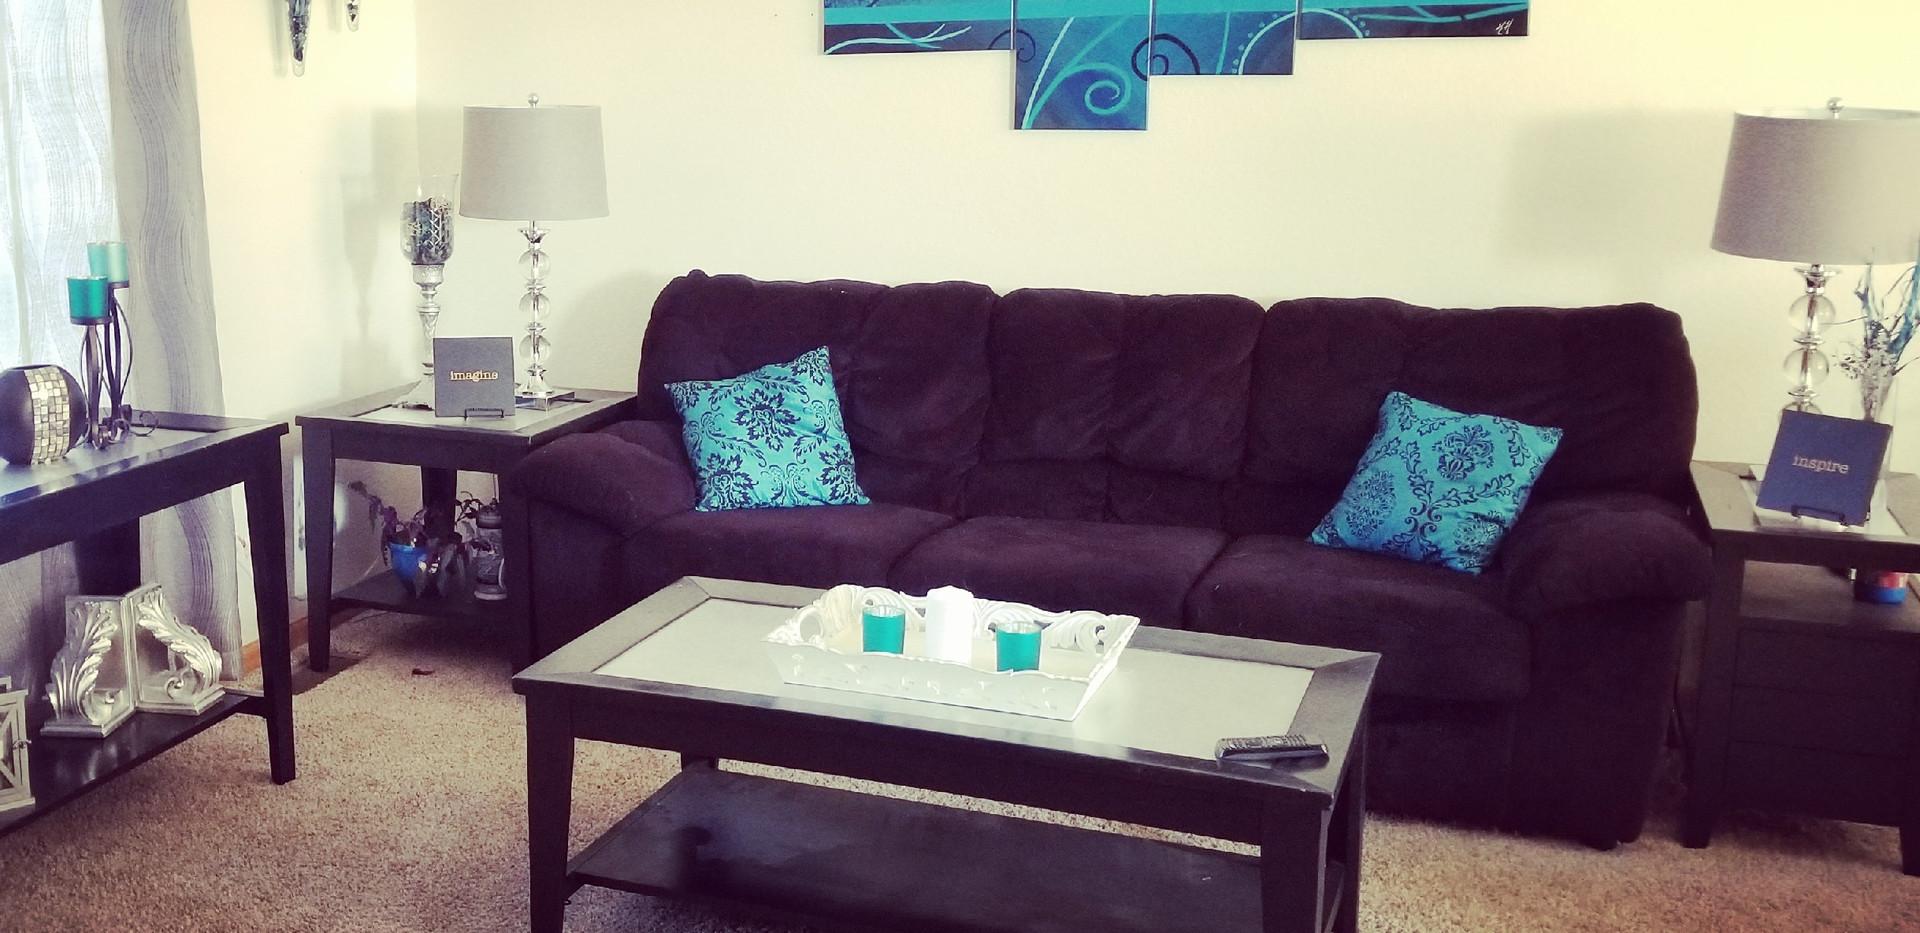 Black and blue living room decor